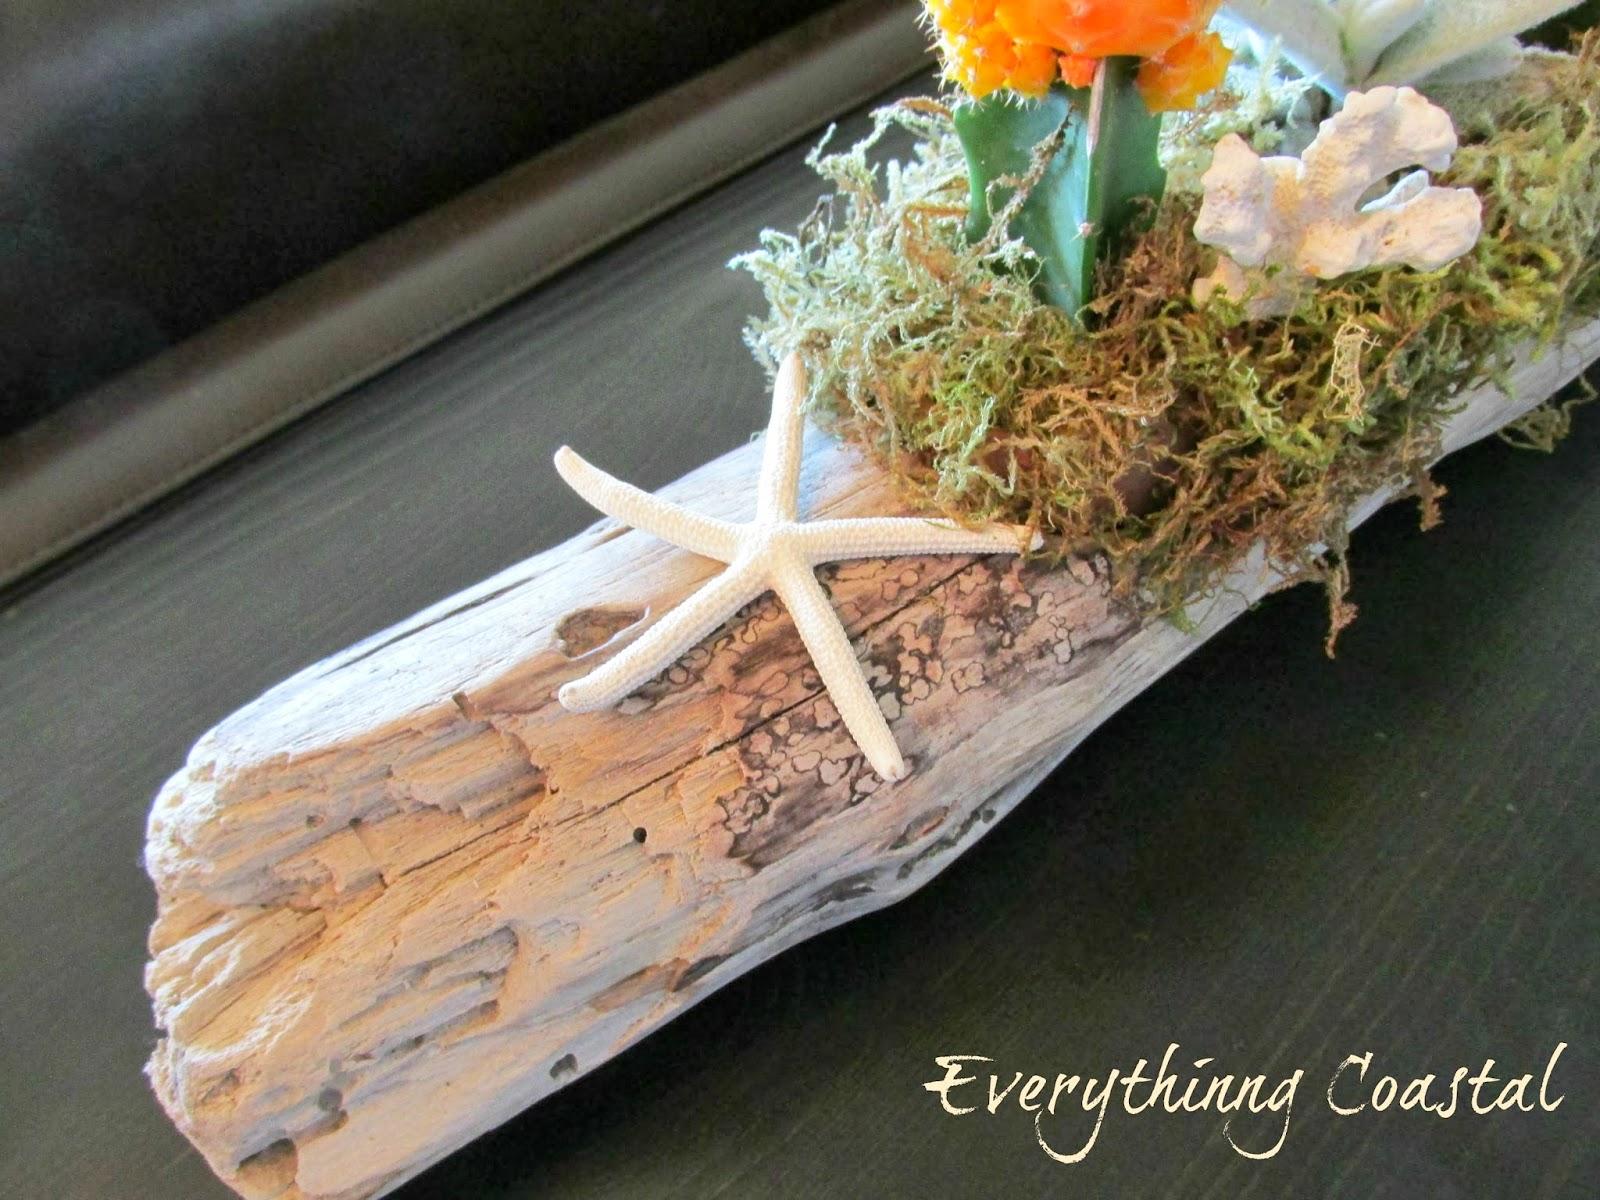 Everything coastal a driftwood centerpiece coastal for Driftwood centerpiece